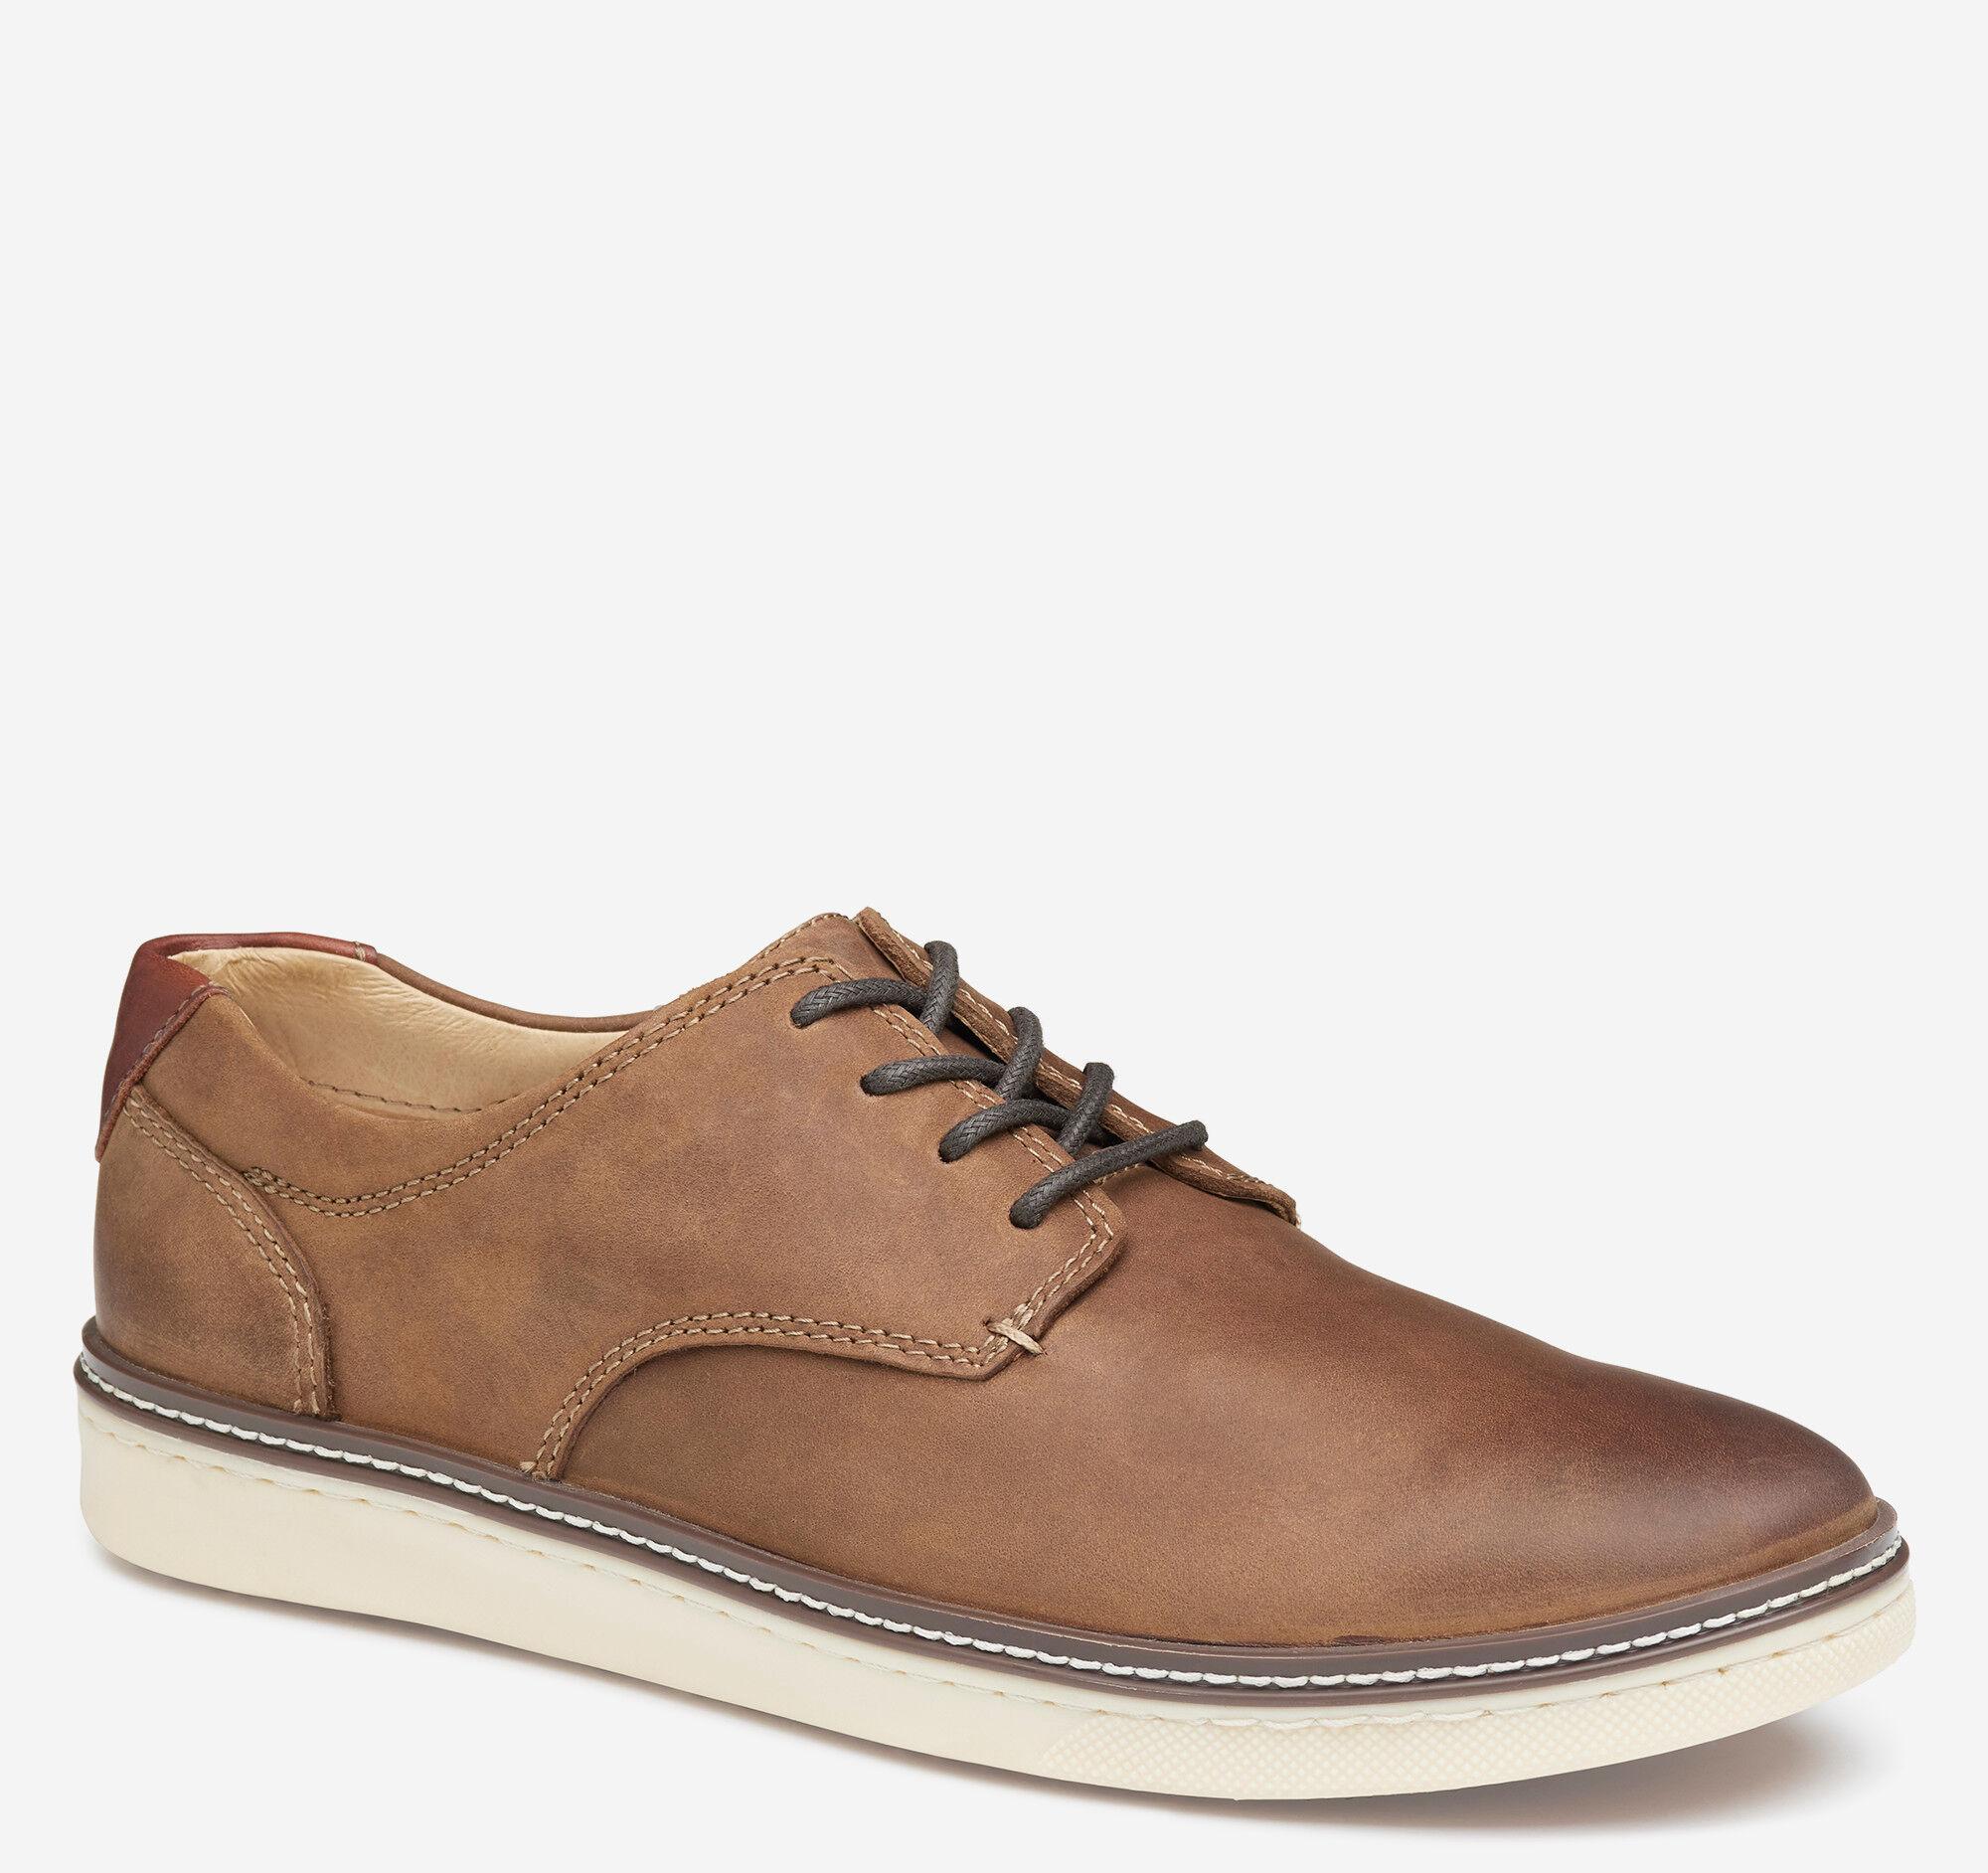 Johnston & Murphy Men's McGuffey Plain Toe Shoe - Tan Oiled Full Grain - Size 8 - M